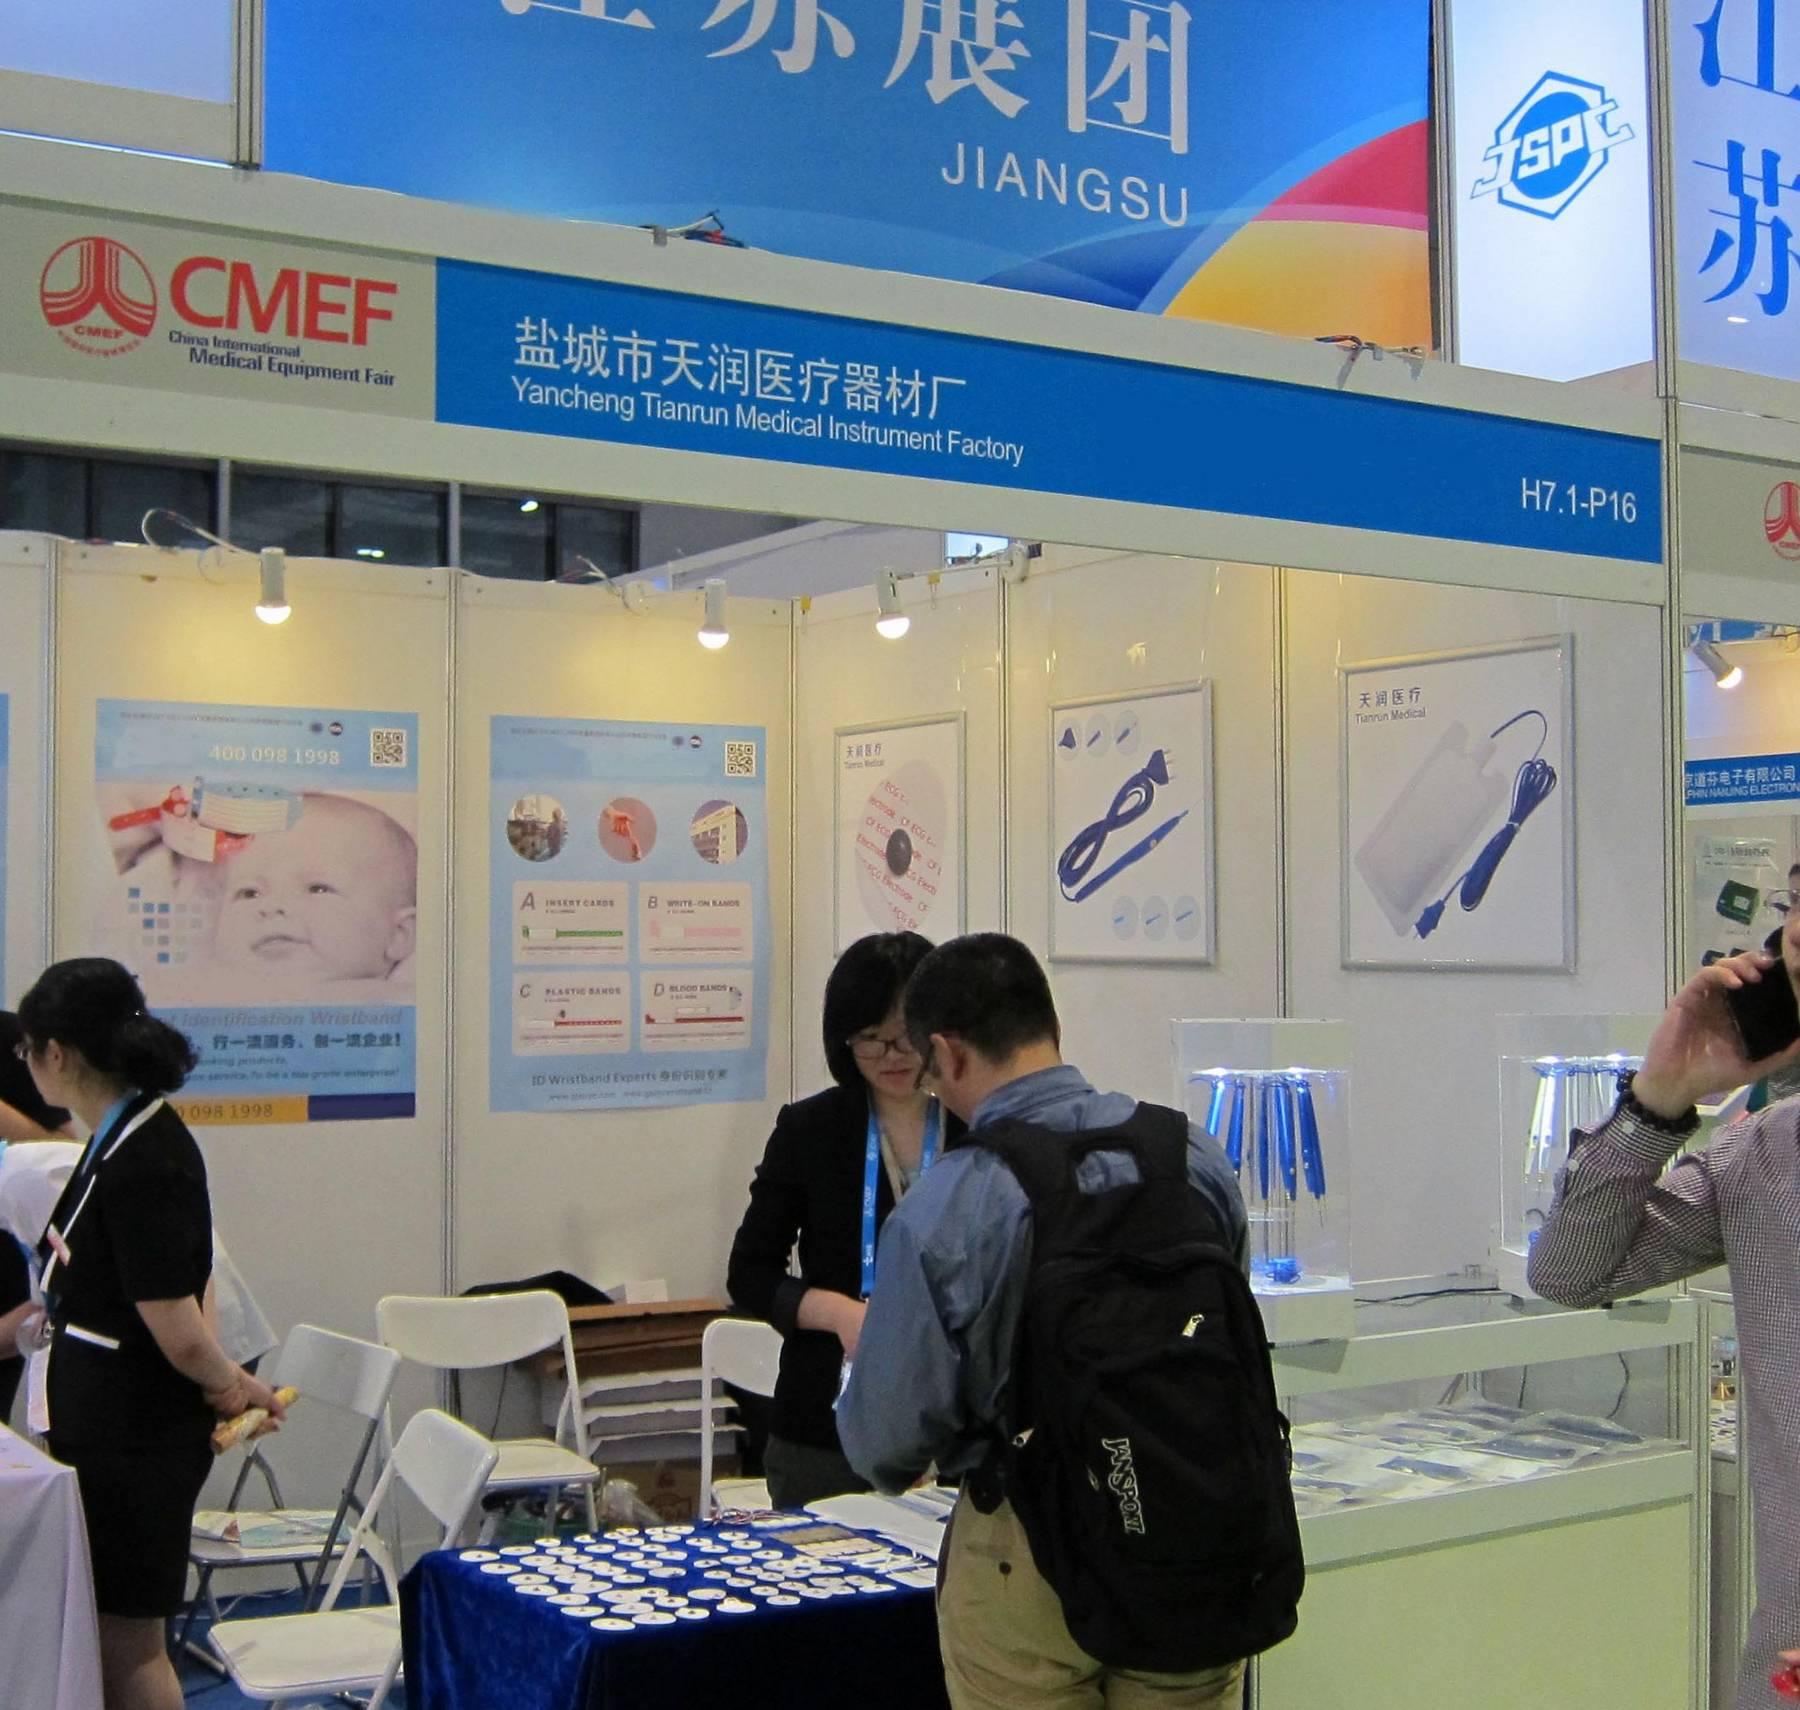 73rd CMEF Shanghai 2015